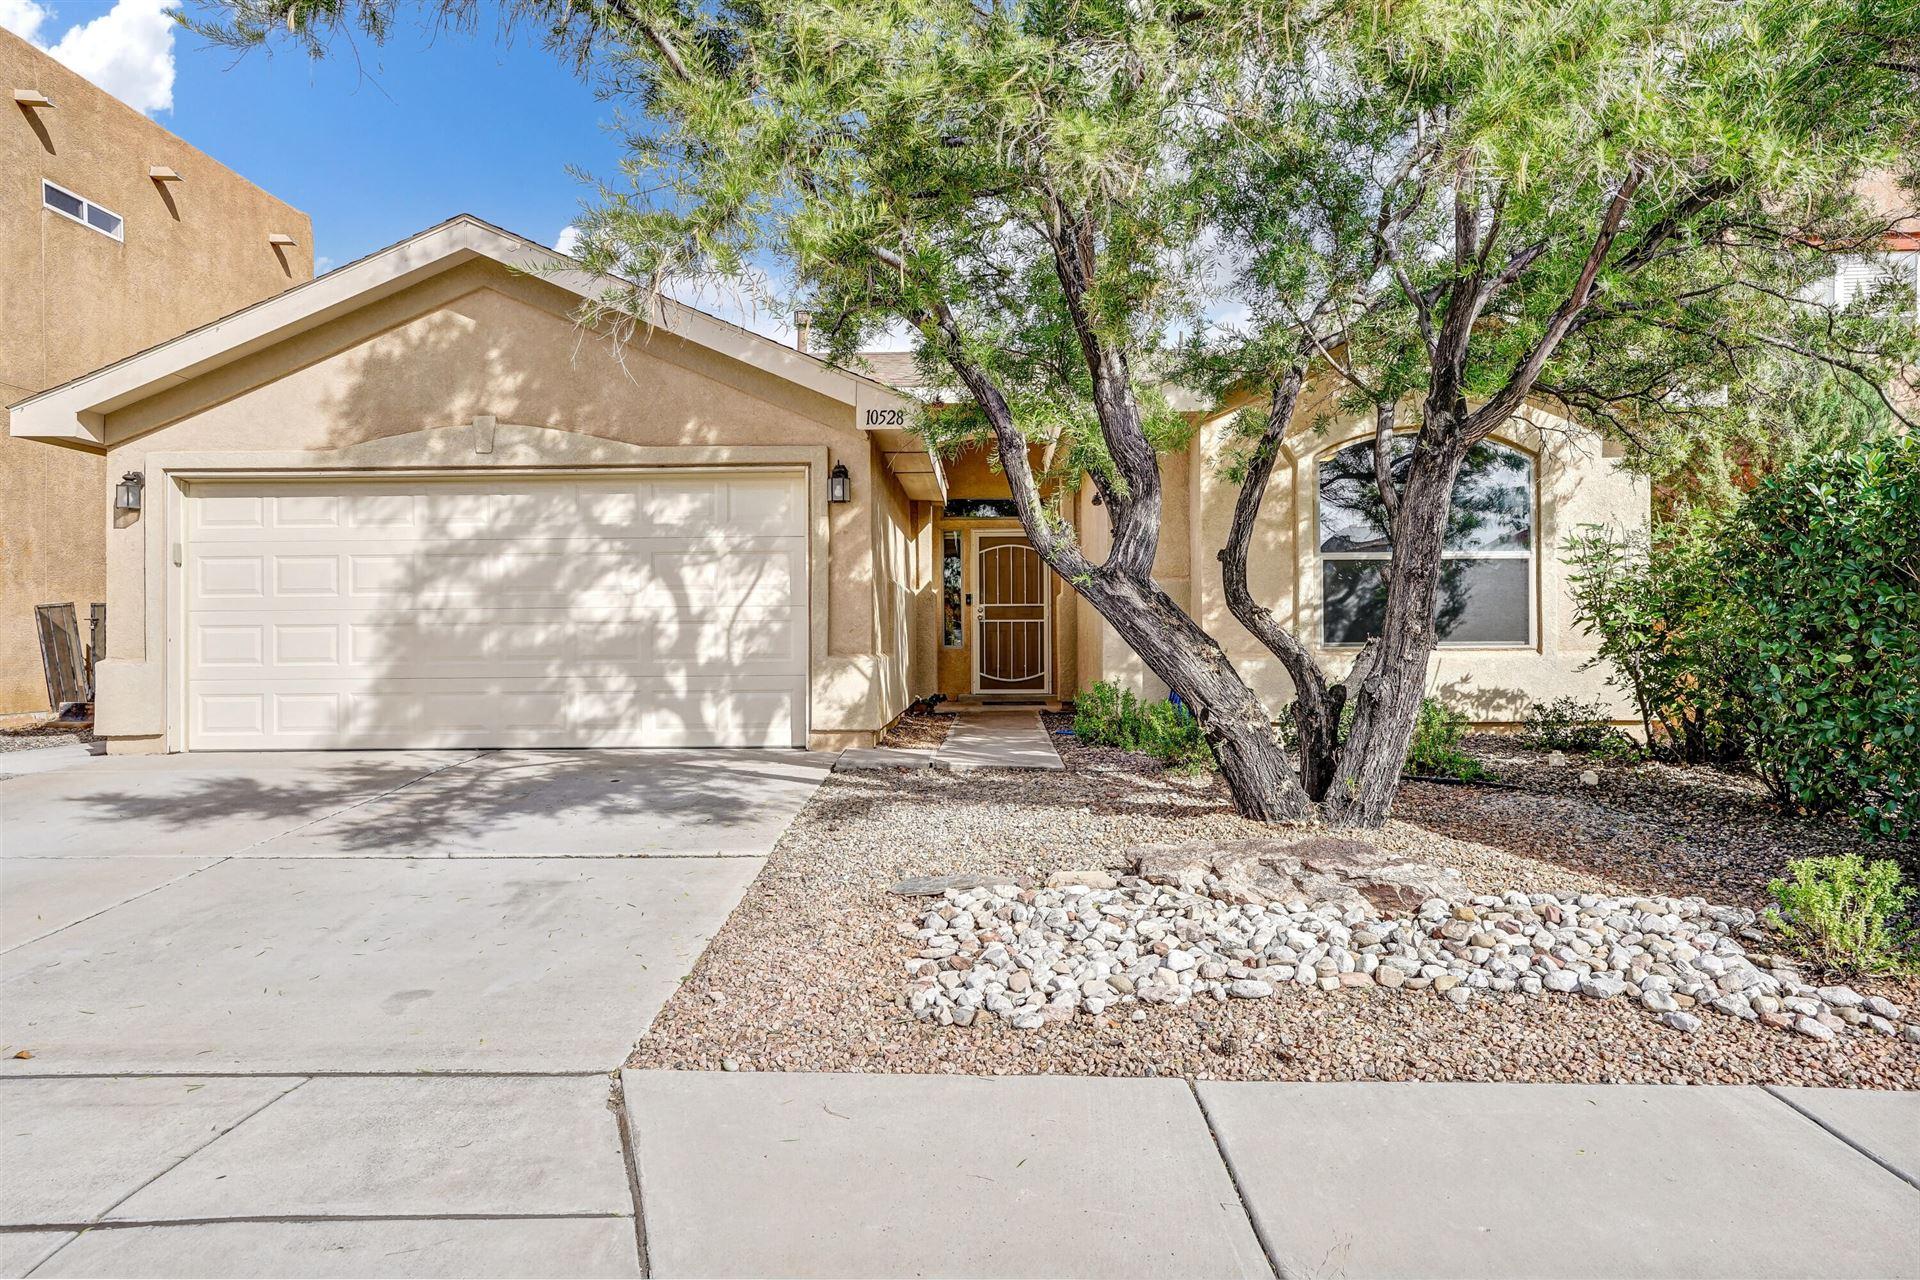 10528 ROSEFINCH Drive NW, Albuquerque, NM 87114 - #: 1002925